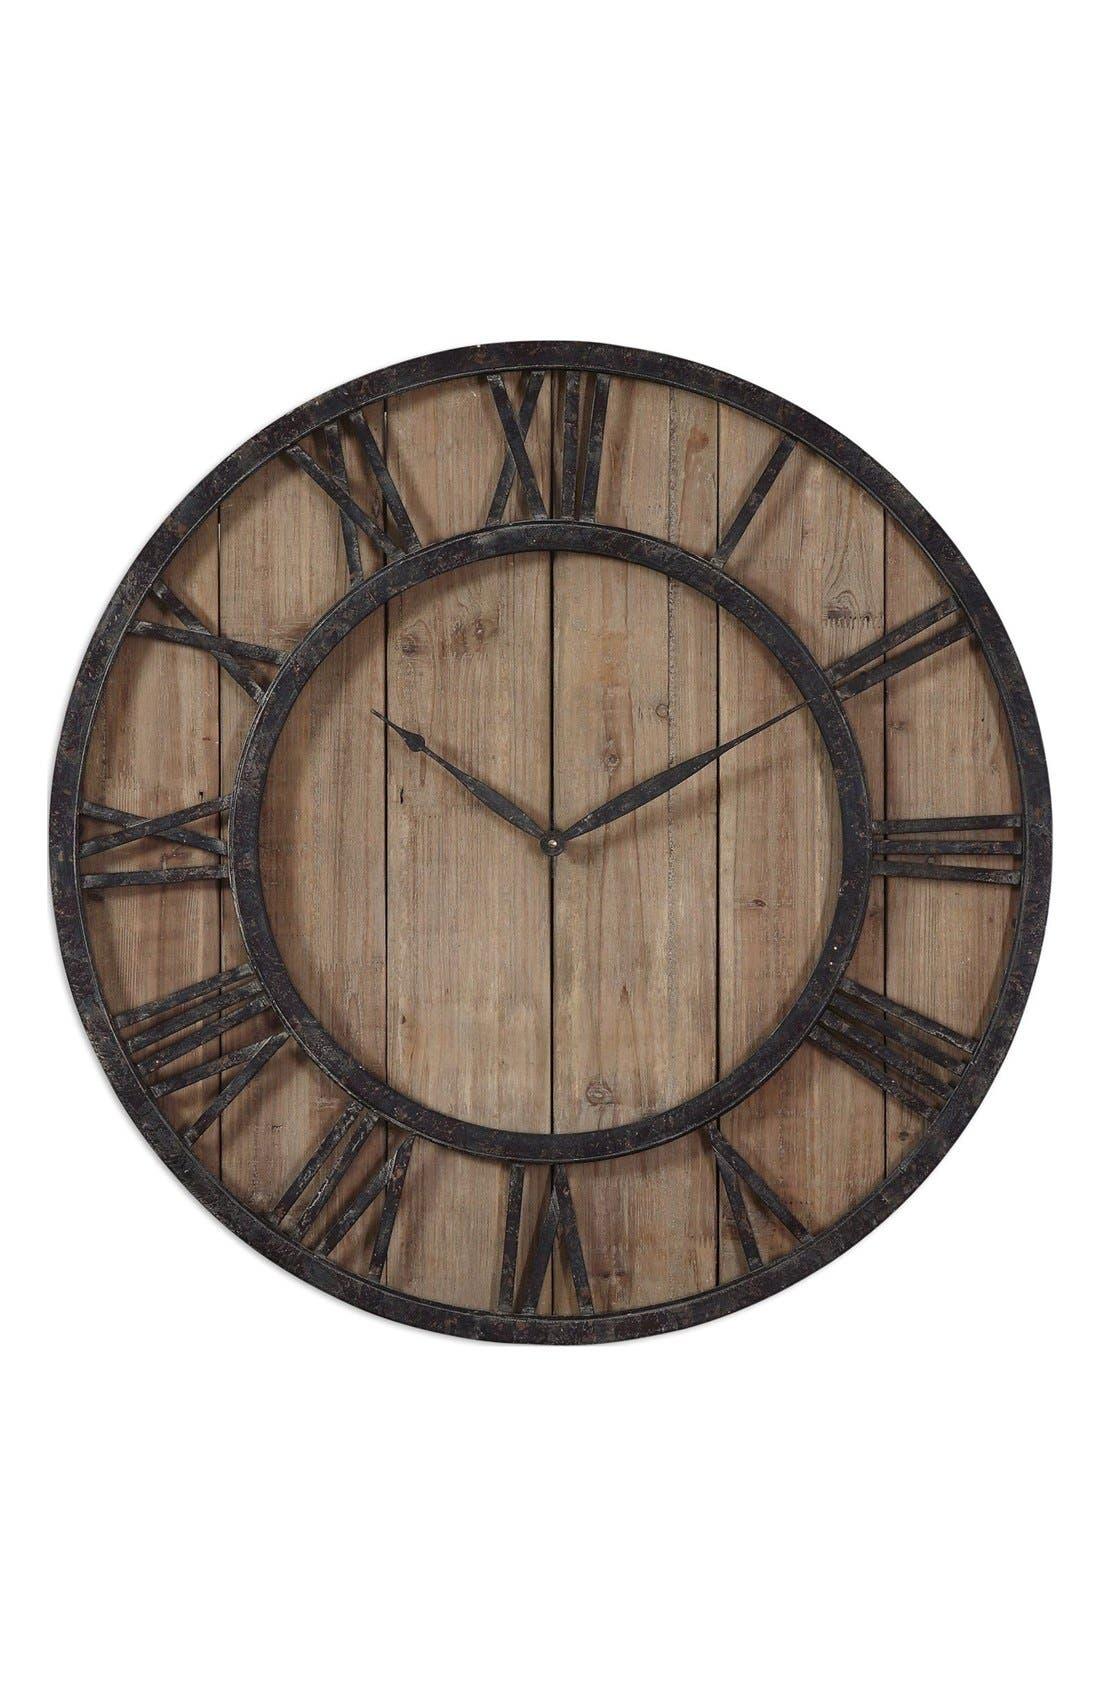 Uttermost 'Powell' Wooden Wall Clock